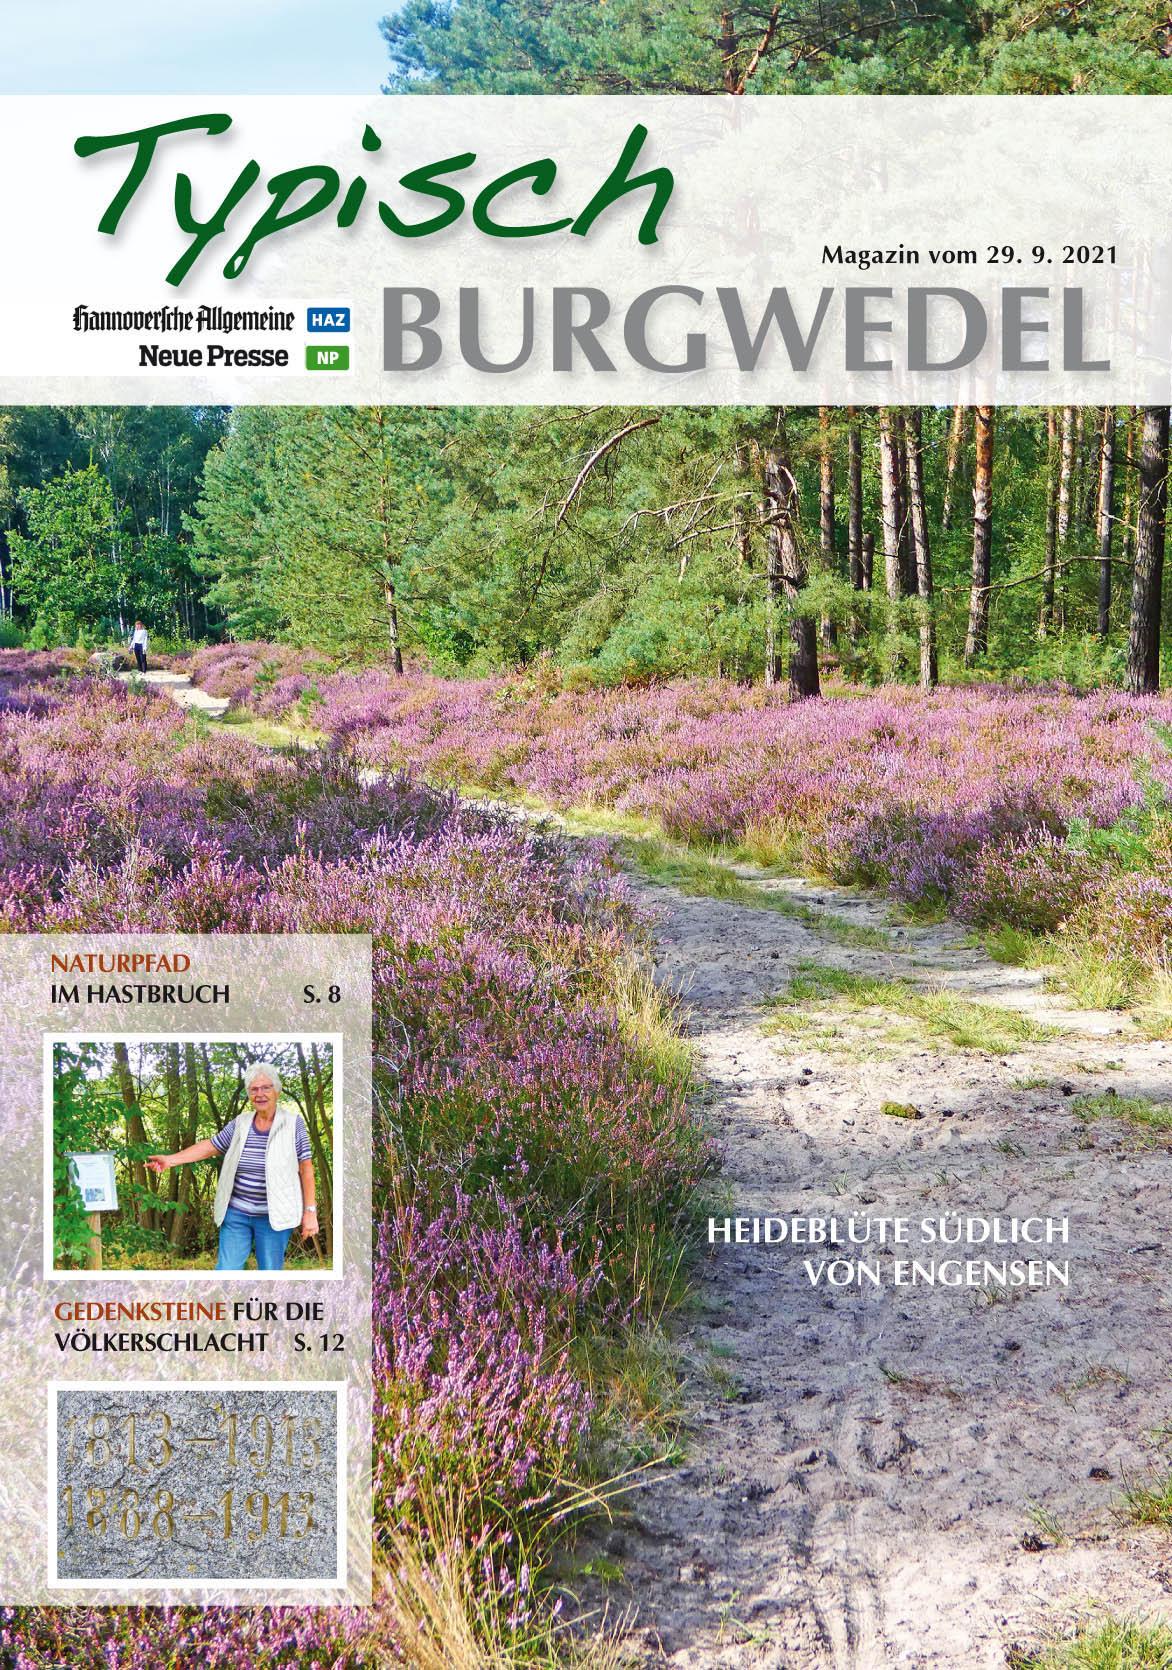 burgwedel 29.09.2021